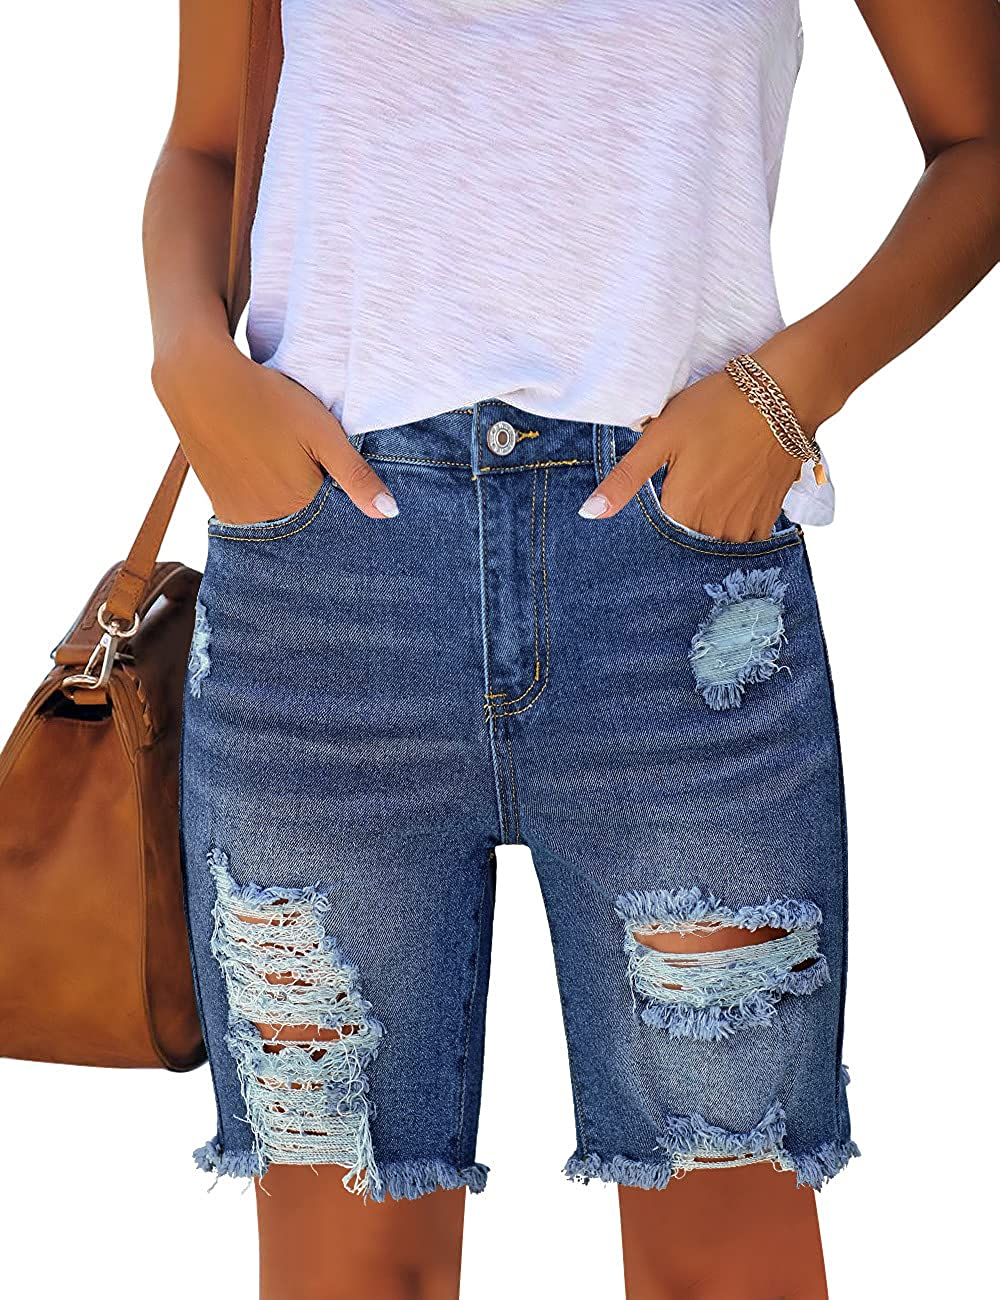 Utyful Women Summer Frayed Ripped Bermuda Shorts Distressed Denim Jeans Short